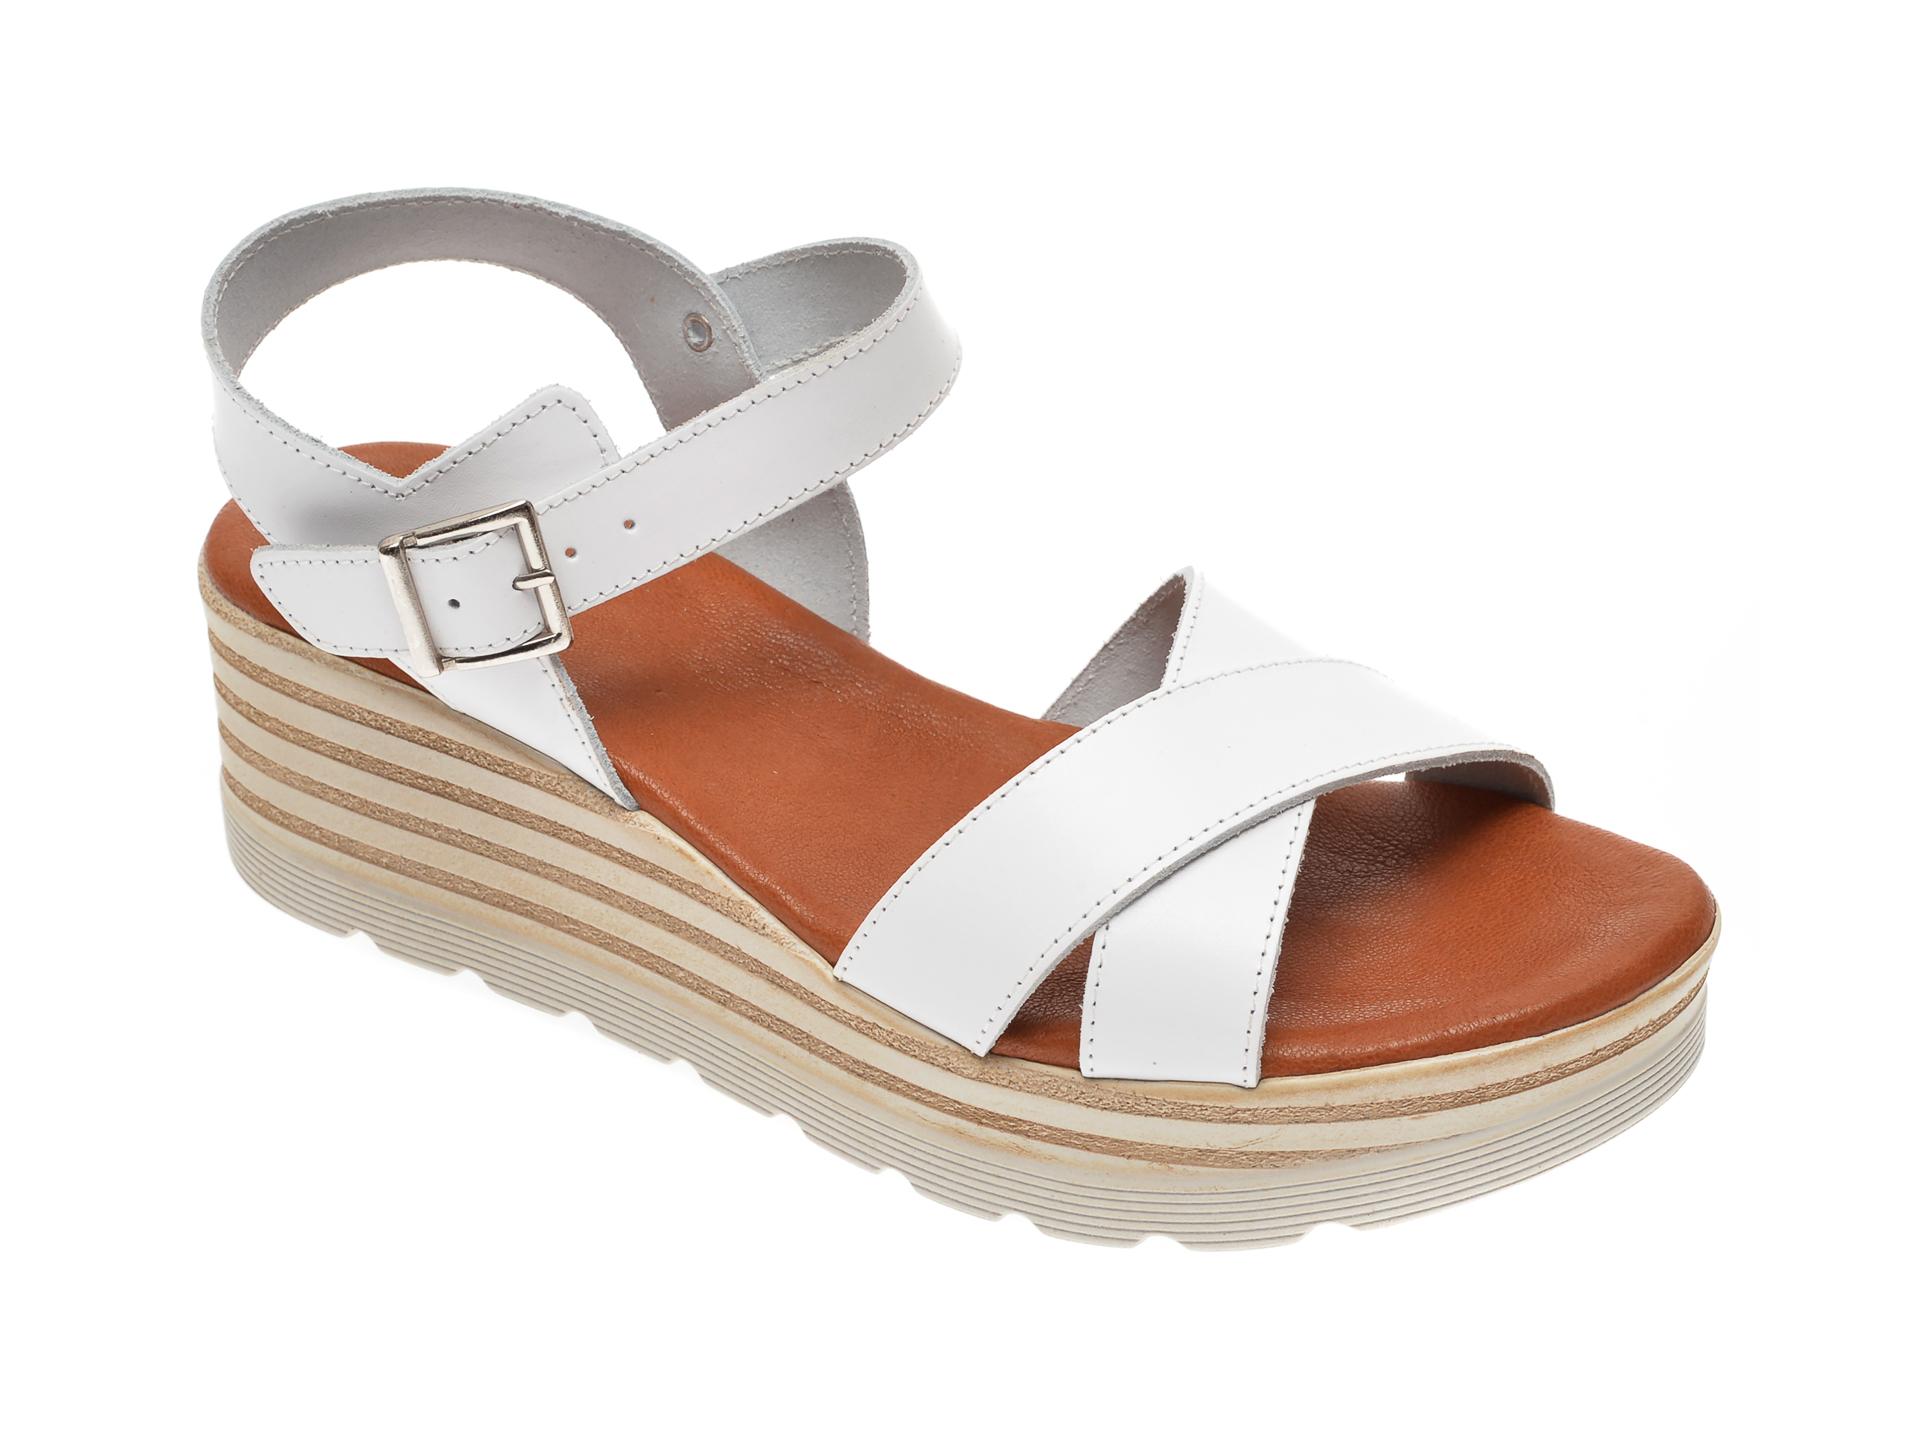 Sandale IMAGE albe, 8110, din piele naturala imagine